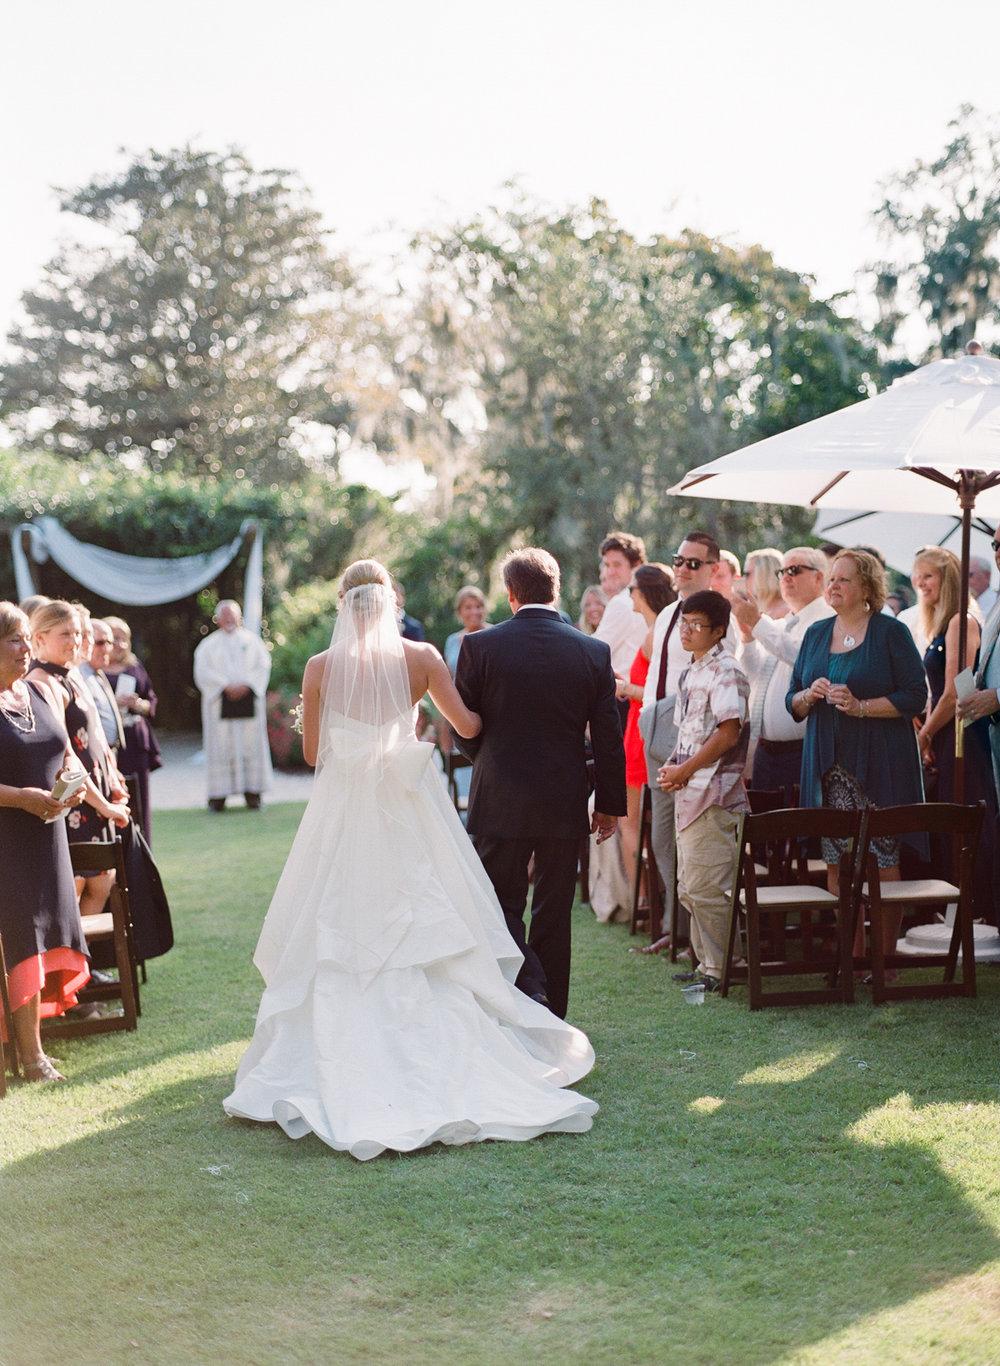 Airlie-Gardens-Wedding-39.jpg